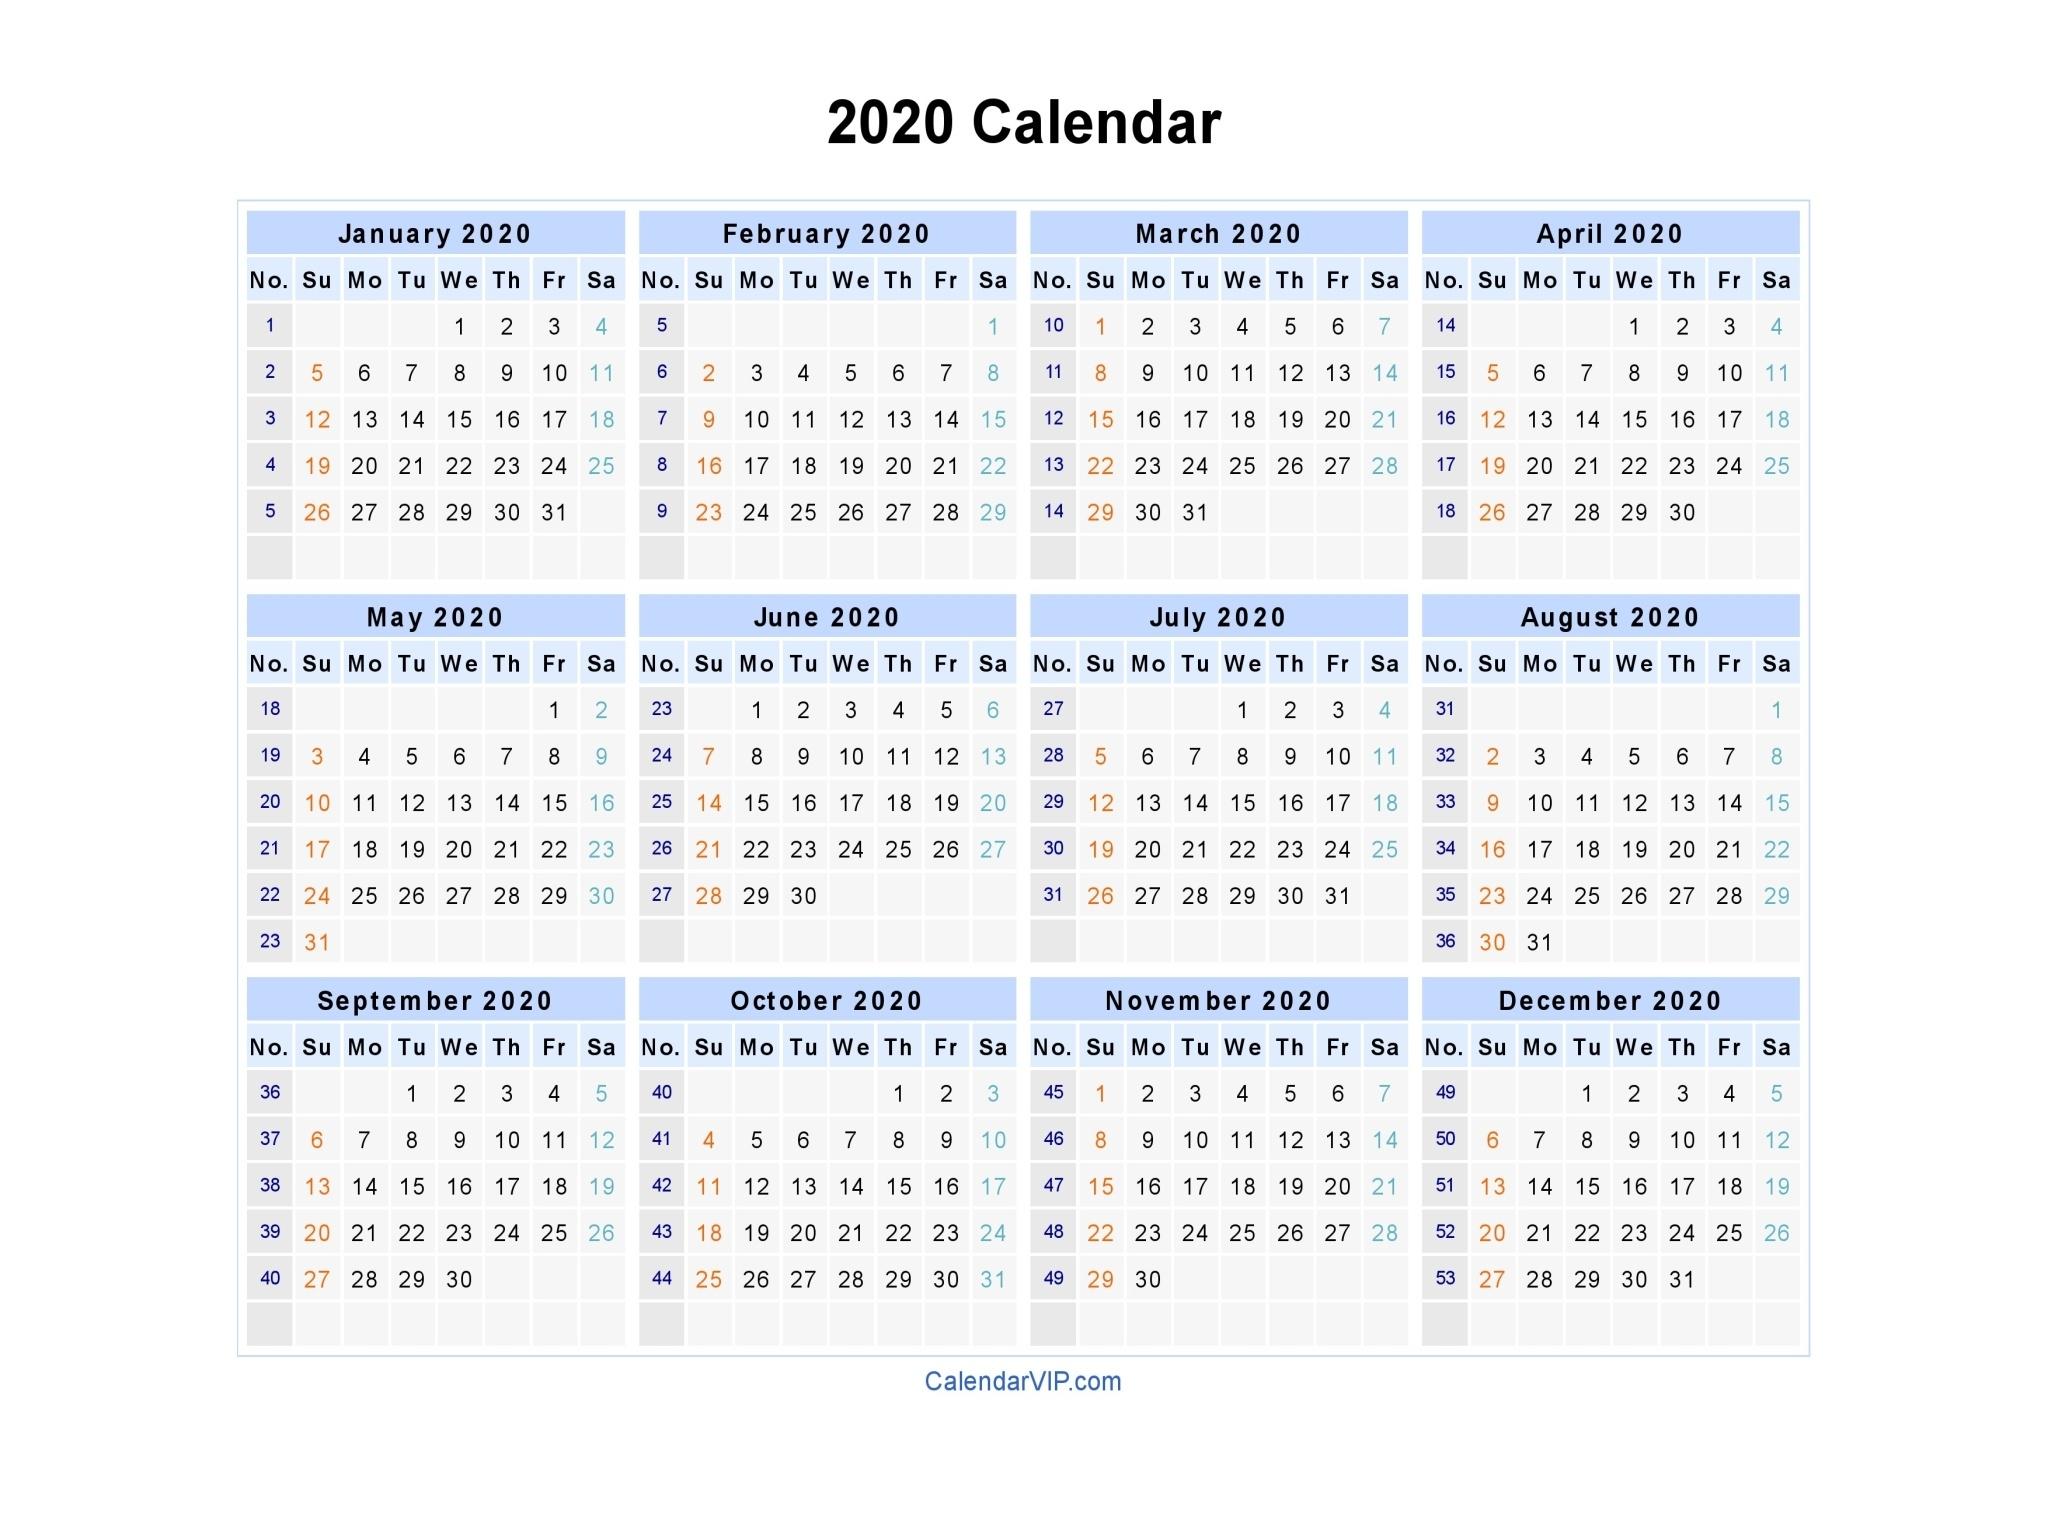 2020 Calendar - Blank Printable Calendar Template In Pdf Word Excel_Blank Calendar 2020 12 Month